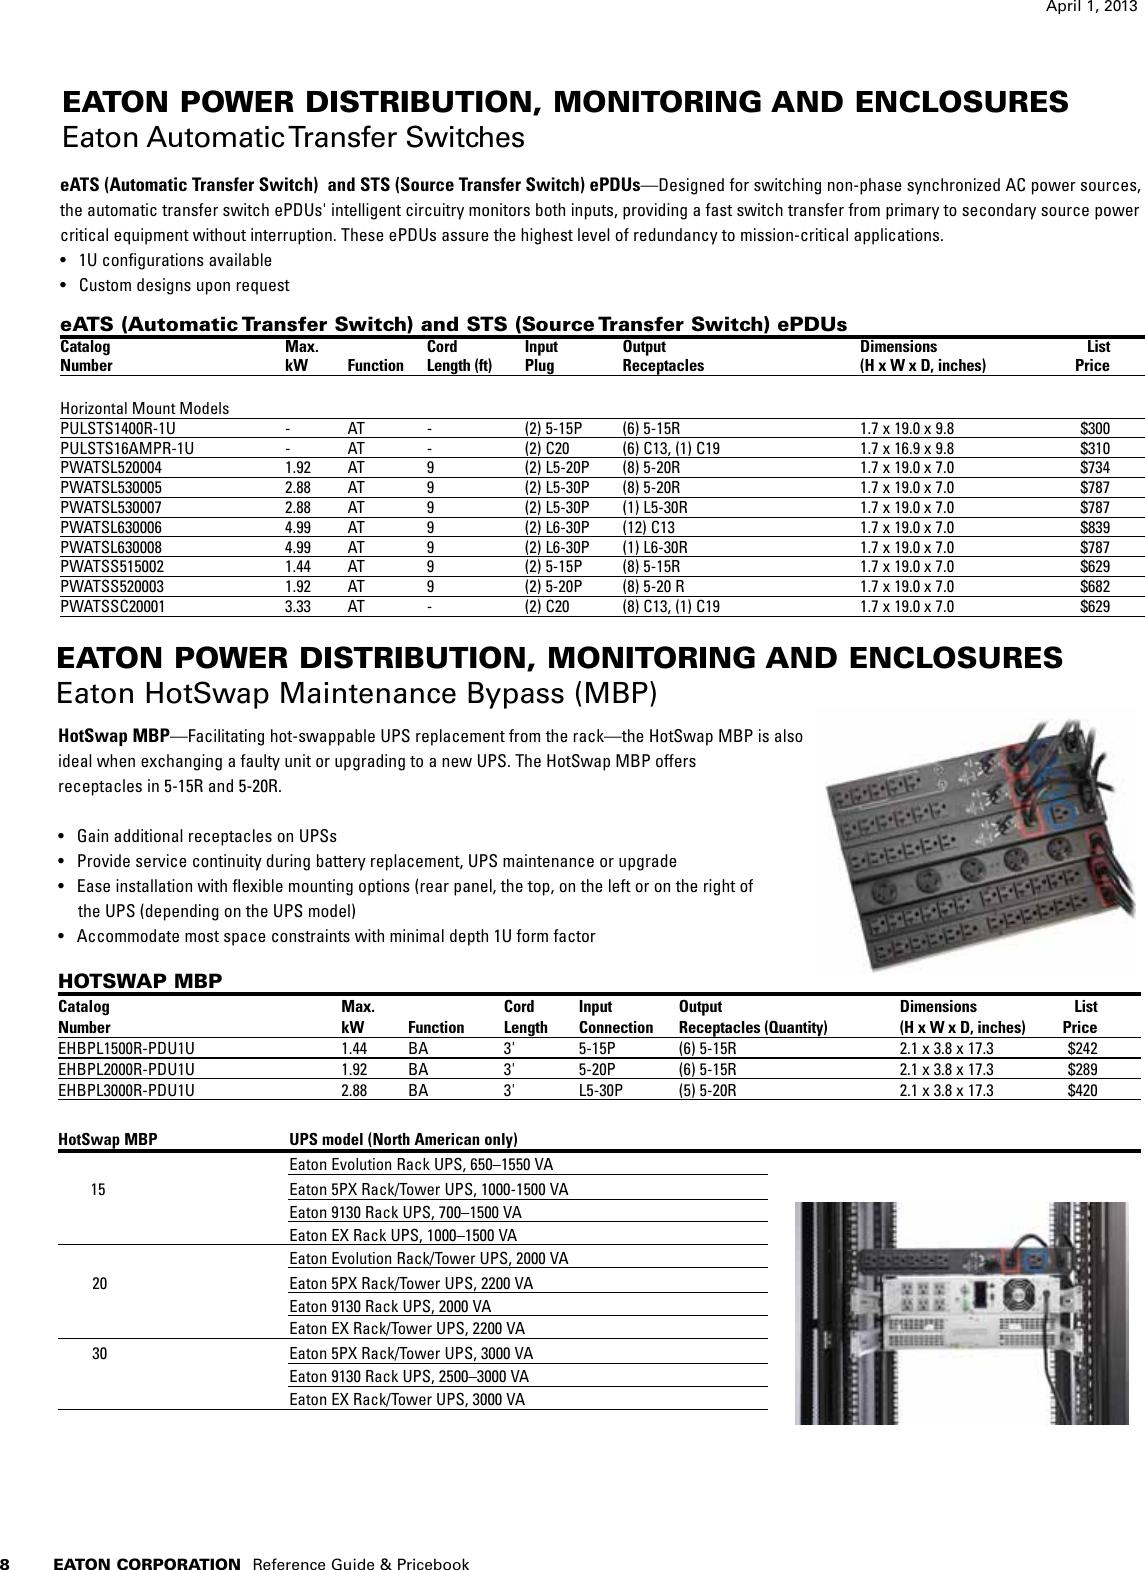 Nema 15 50p Plug Wiring Diagram - Wiring Diagram Nema L R Wiring Diagram on